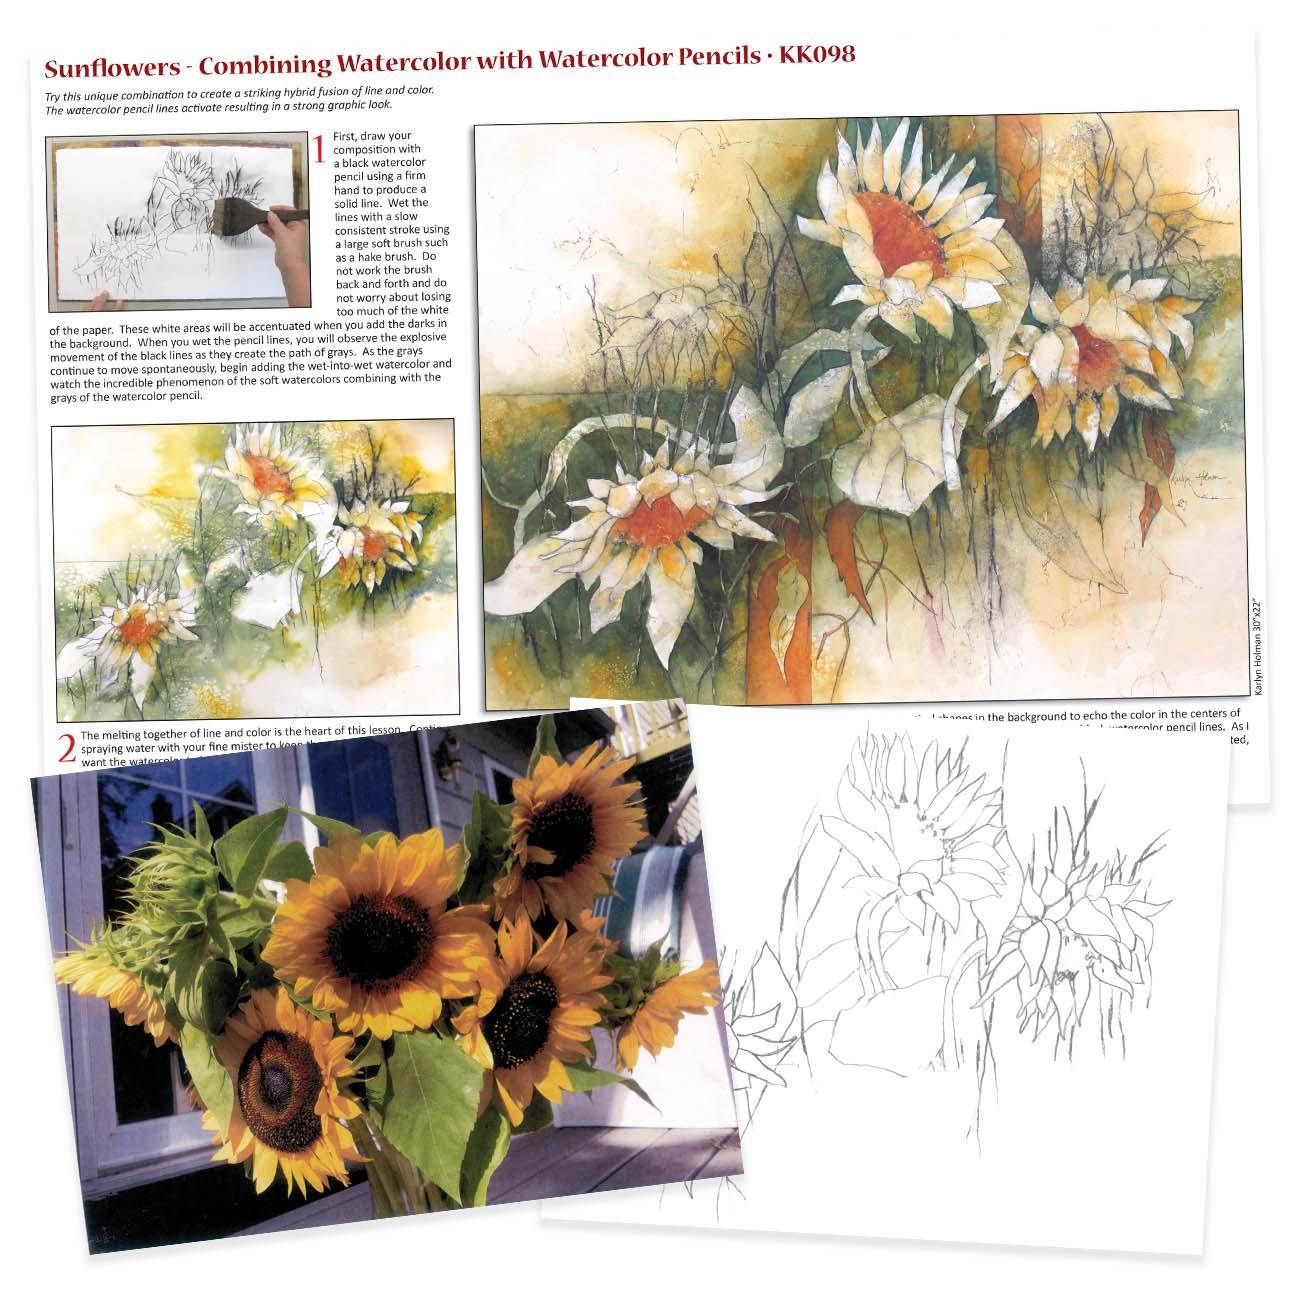 KK098 - Sunflowers, Watercolor with Watercolor Pencils